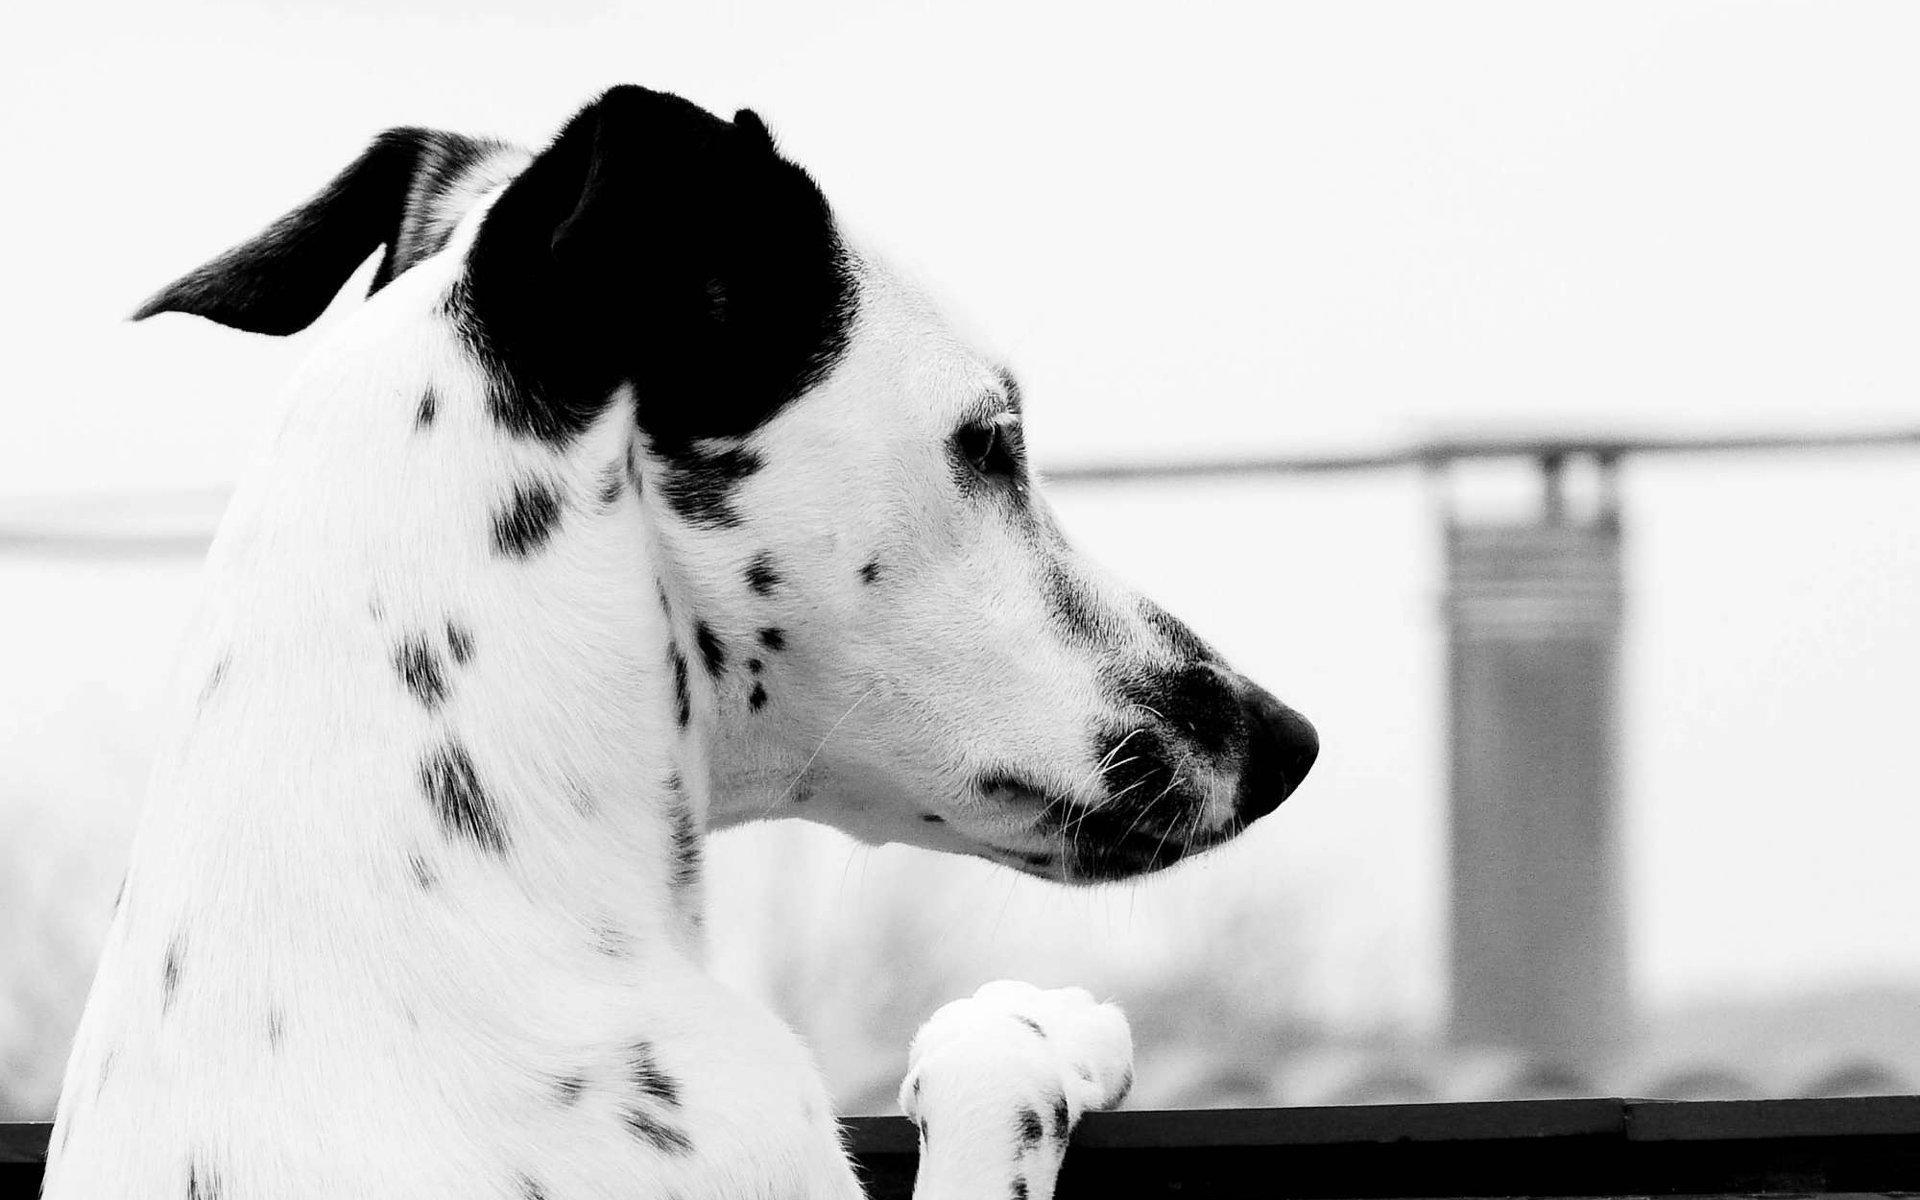 monochrome dalmatian dog wallpaper 50354